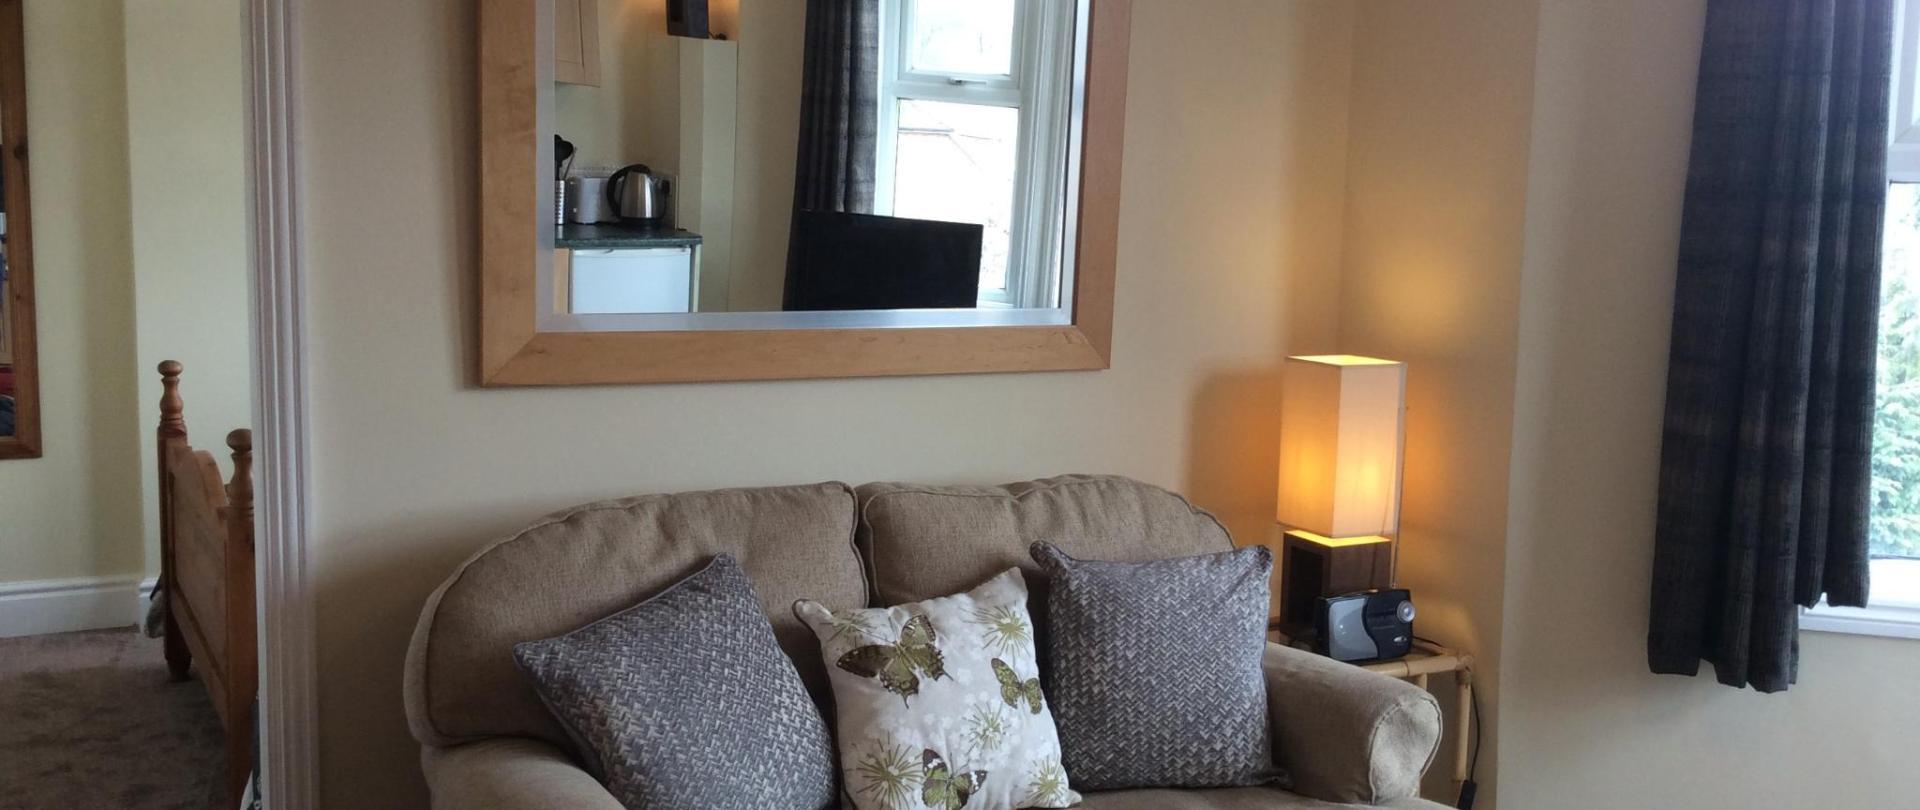 Sofa Sunnyside.jpg